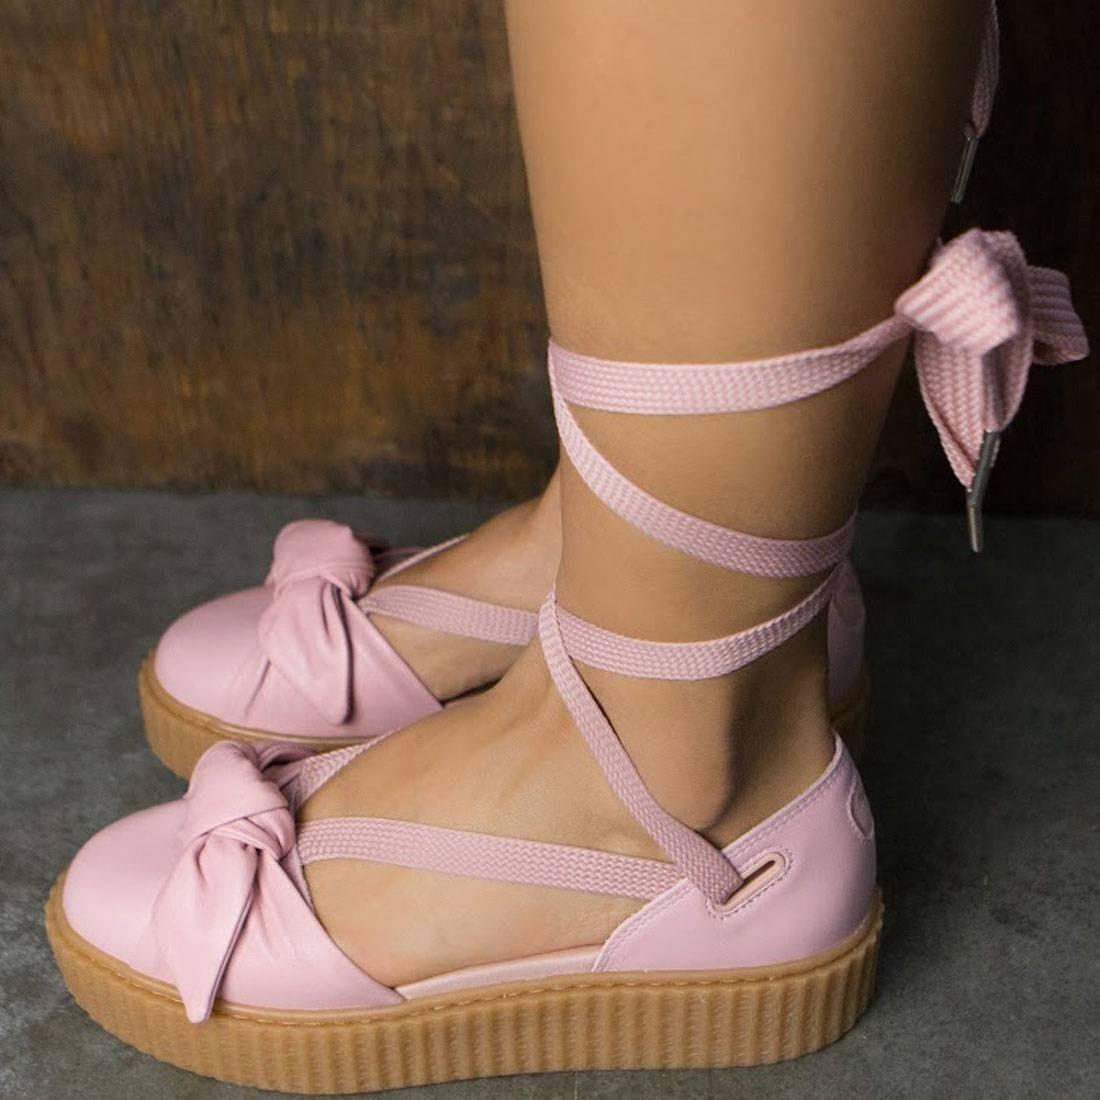 buy online dca03 3c75b Puma x Fenty By Rihanna Women Bow Creeper Sandal (silver / pink / oatmeal)